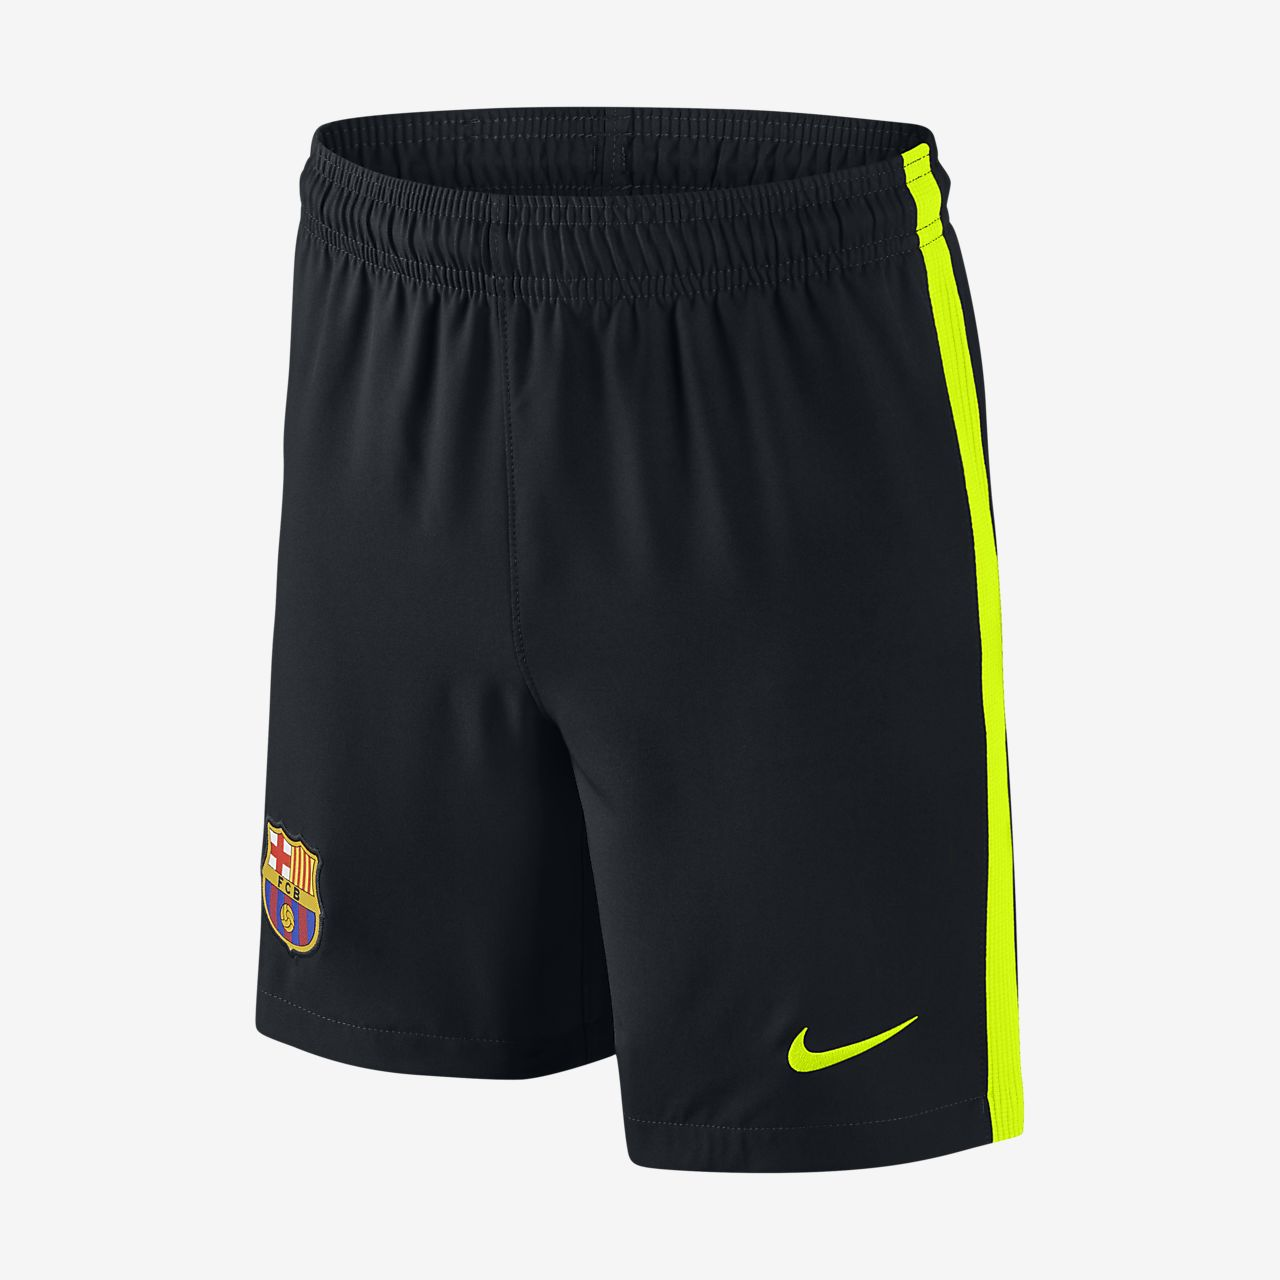 Shorts da calcio 2016/17 FC Barcelona Stadium Home/Away/Third/Goalkeeper - Ragazzi